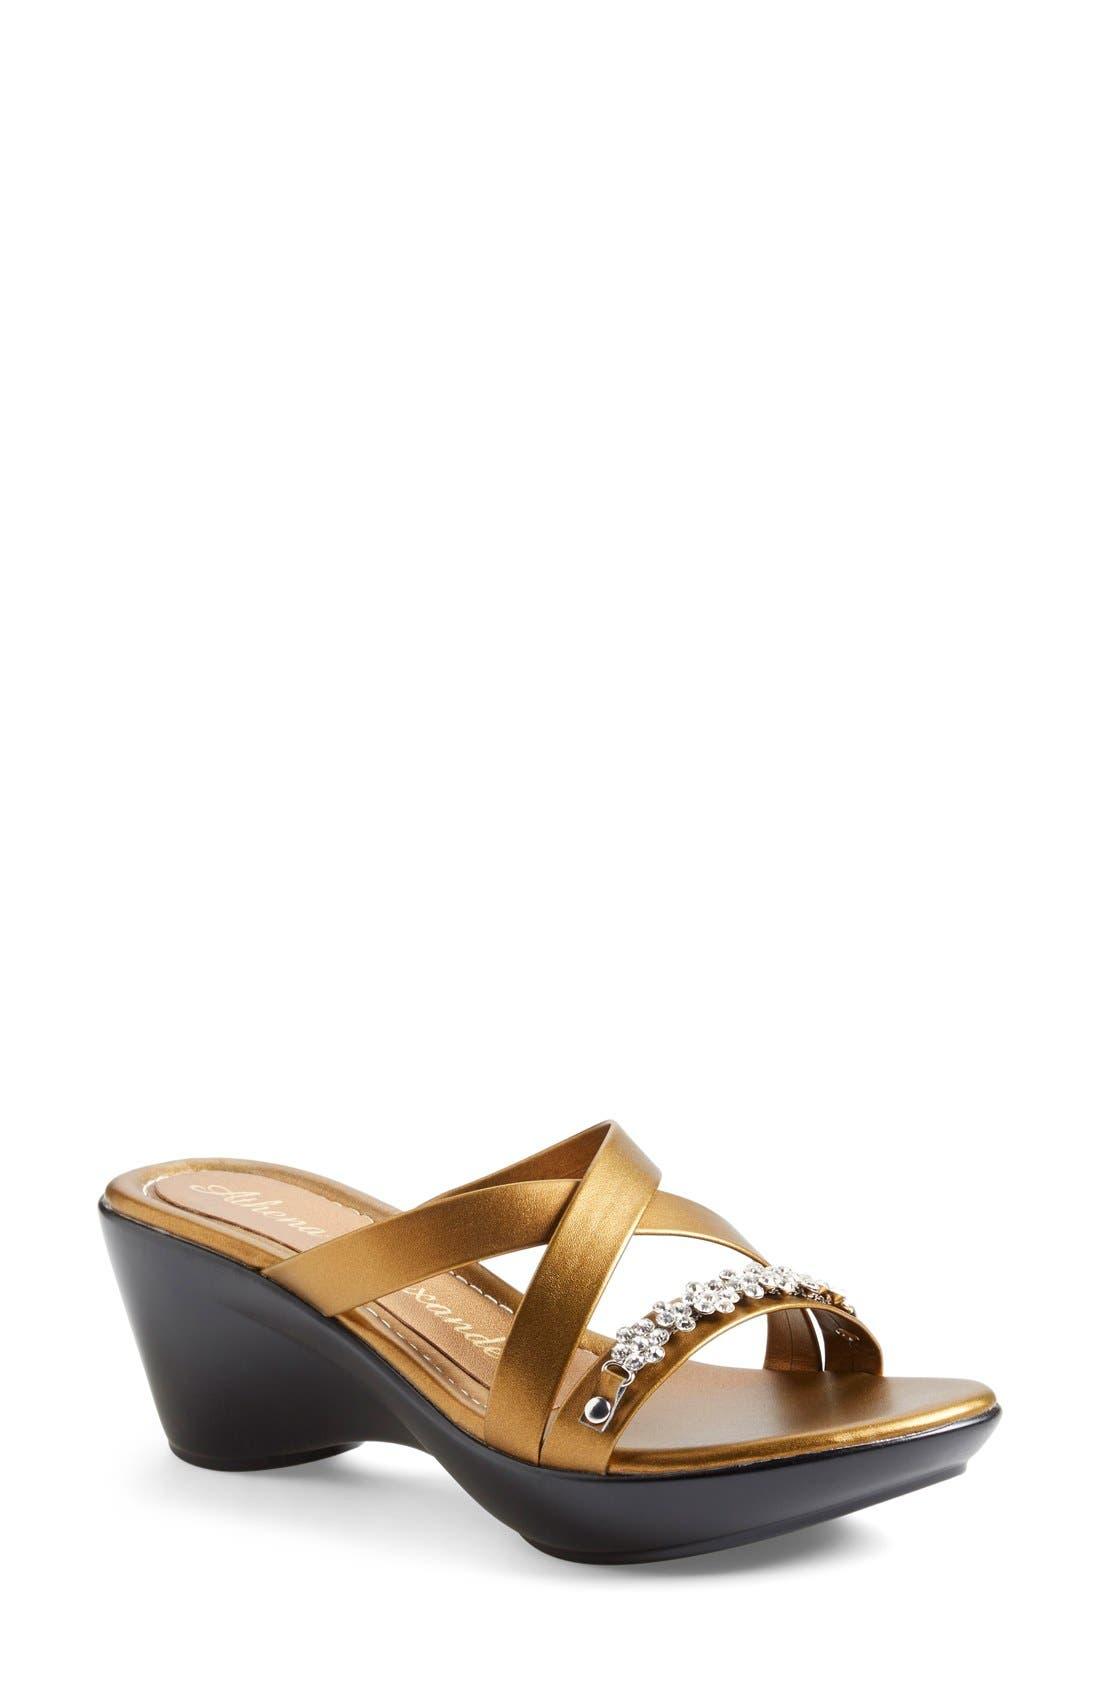 Main Image - Athena Alexander 'Tangie' Crystal Embellished Wedge Sandal (Women)